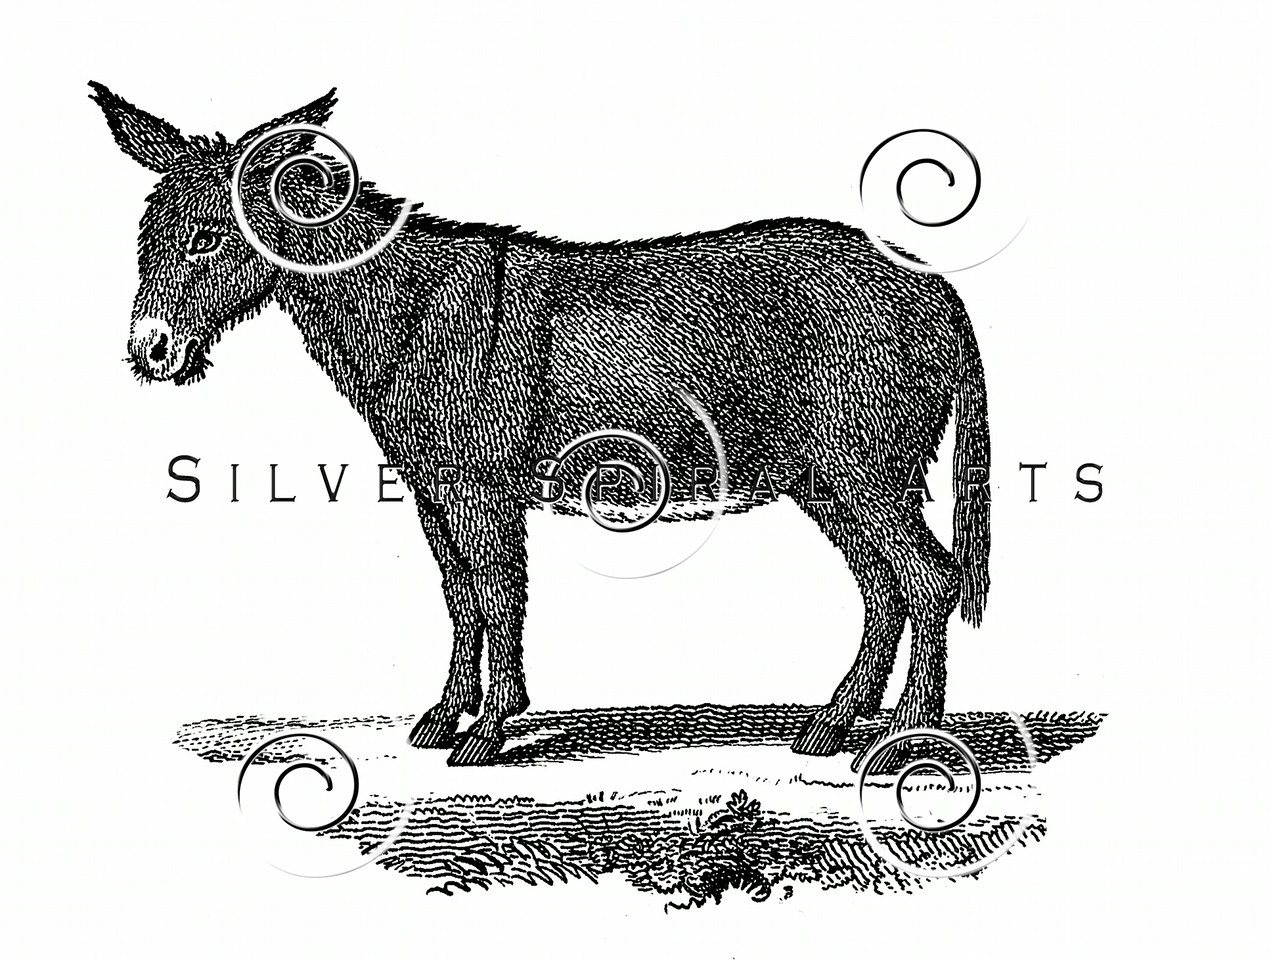 Vintage Donkey Illustration - 1800s Mule Images.